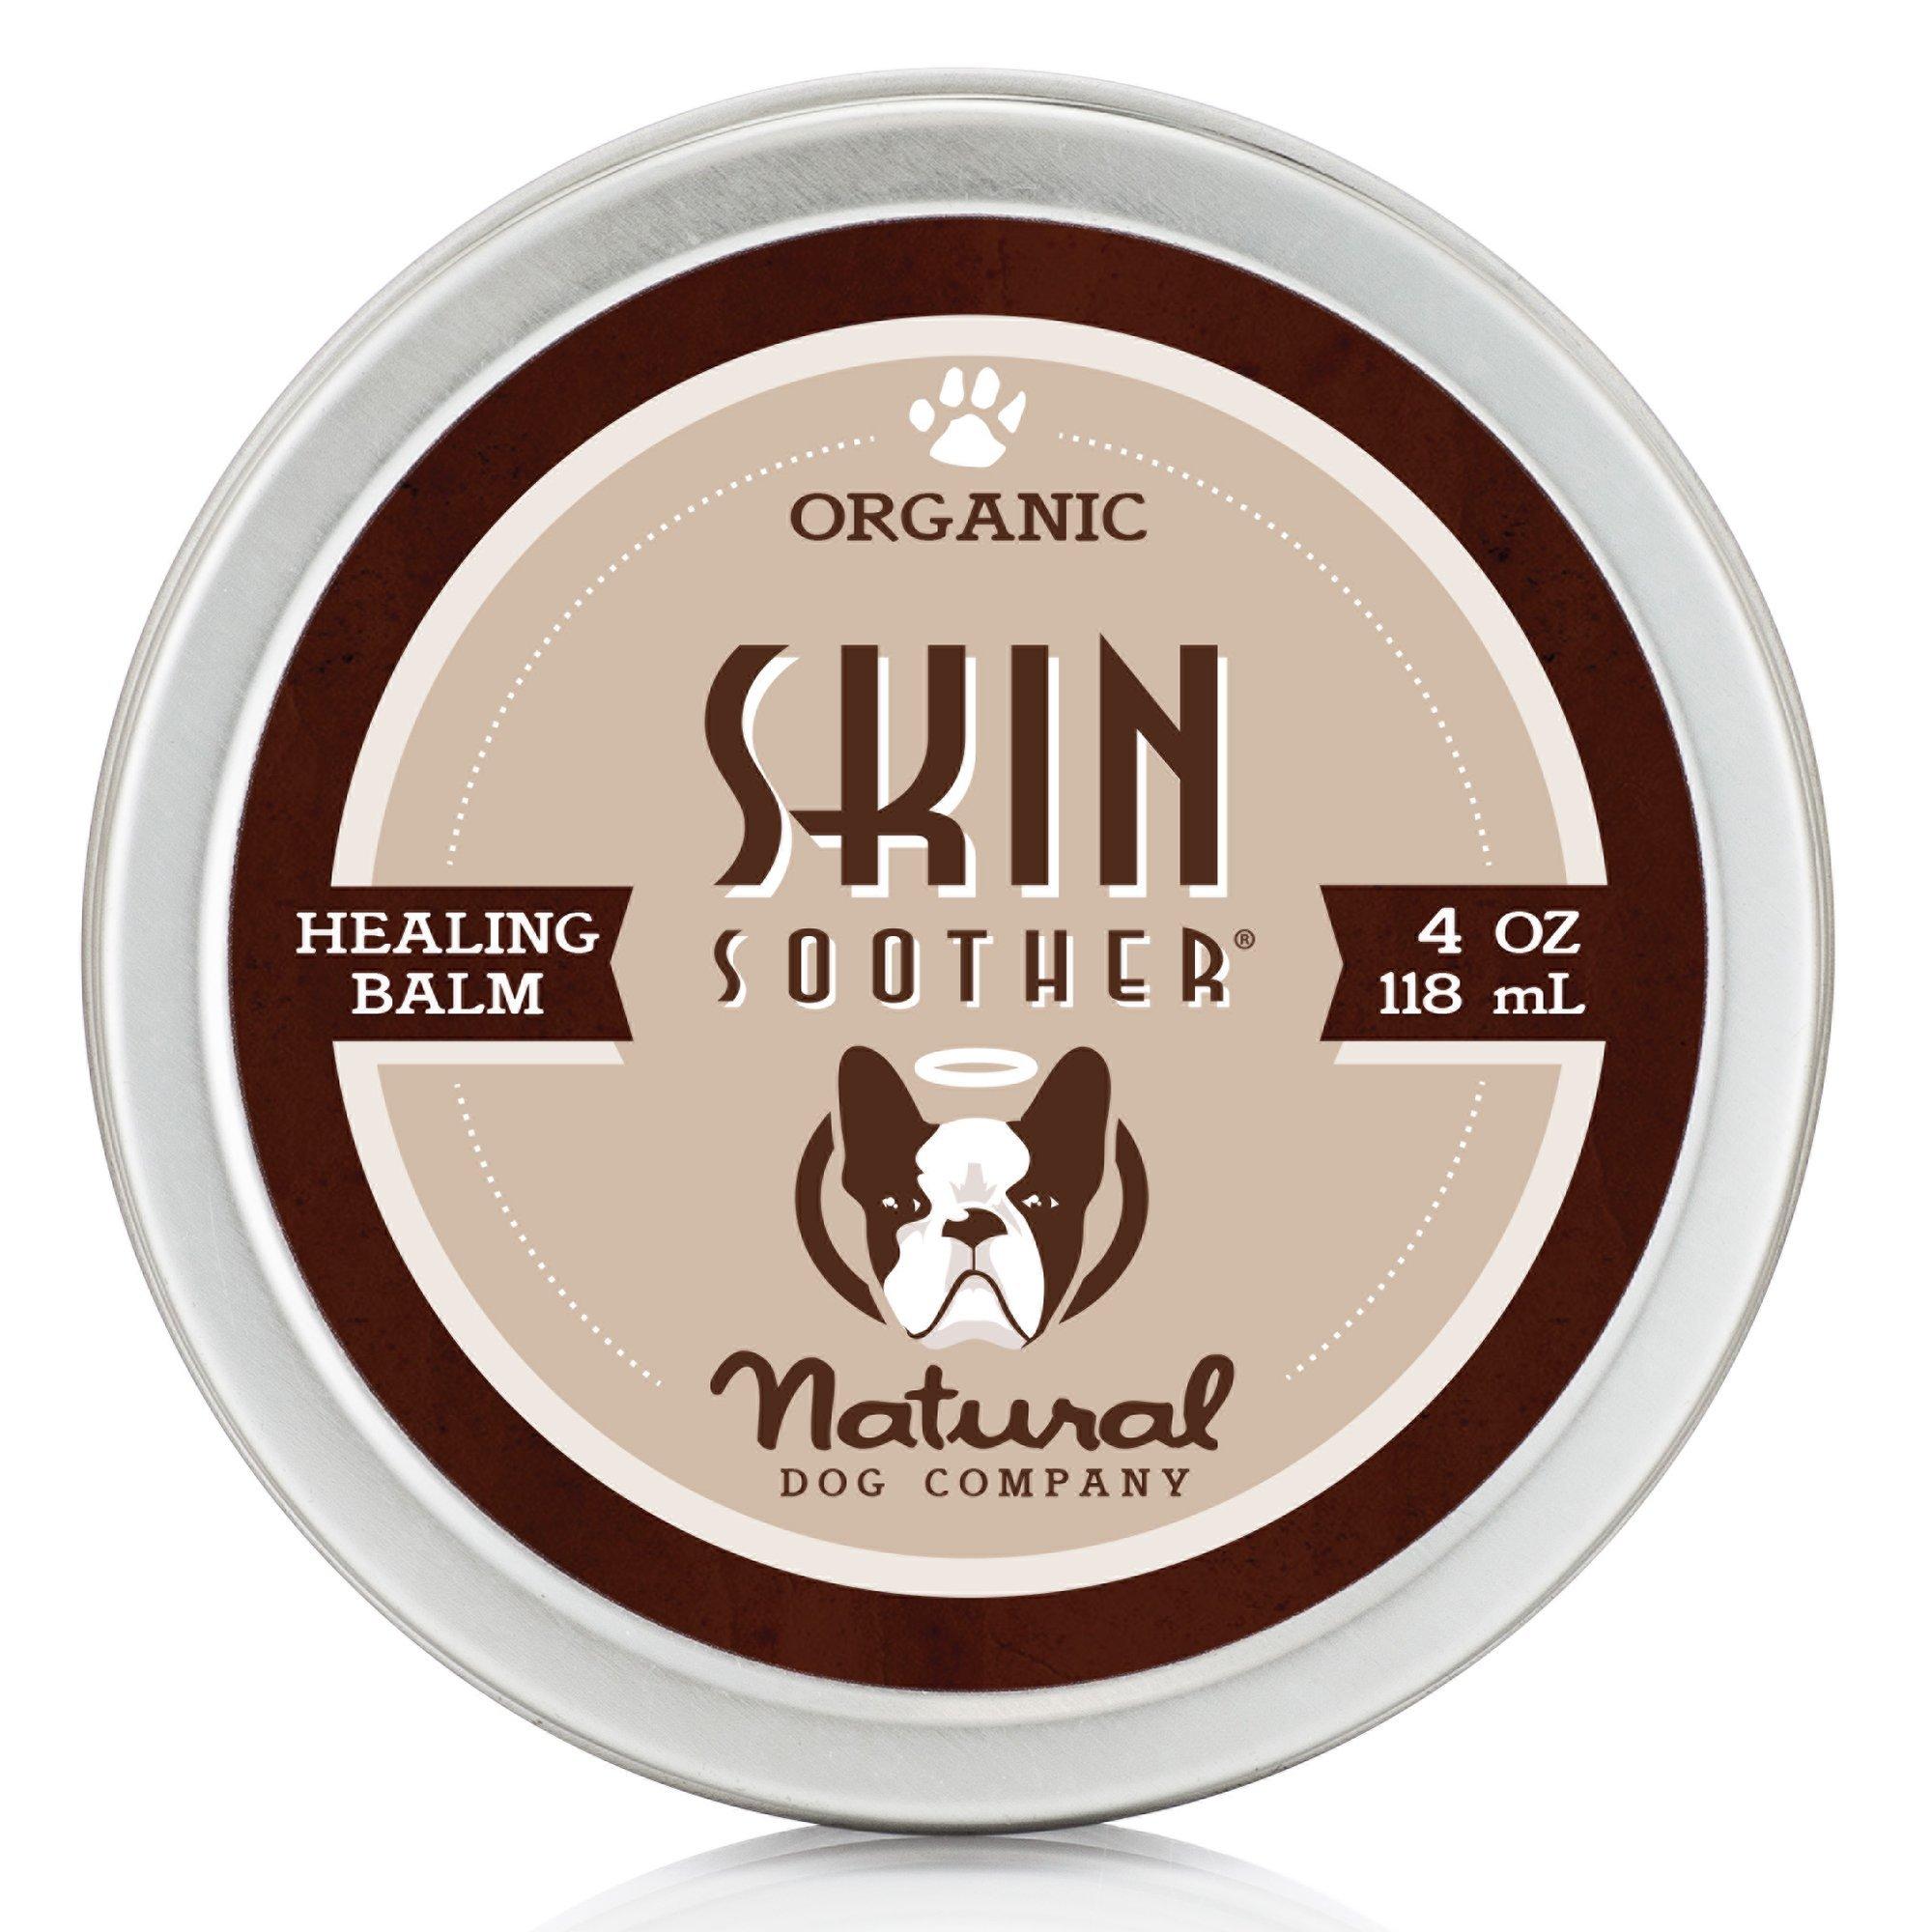 Natural Dog Company - Skin Soother | Organic, All-Natural Healing Balm - Treats Hot Spots, Bacterial Folliculitis, Dermatitis, Alopecia, Mange, Dry Flaky Skin | 4 Oz Tin by Natural Dog Company